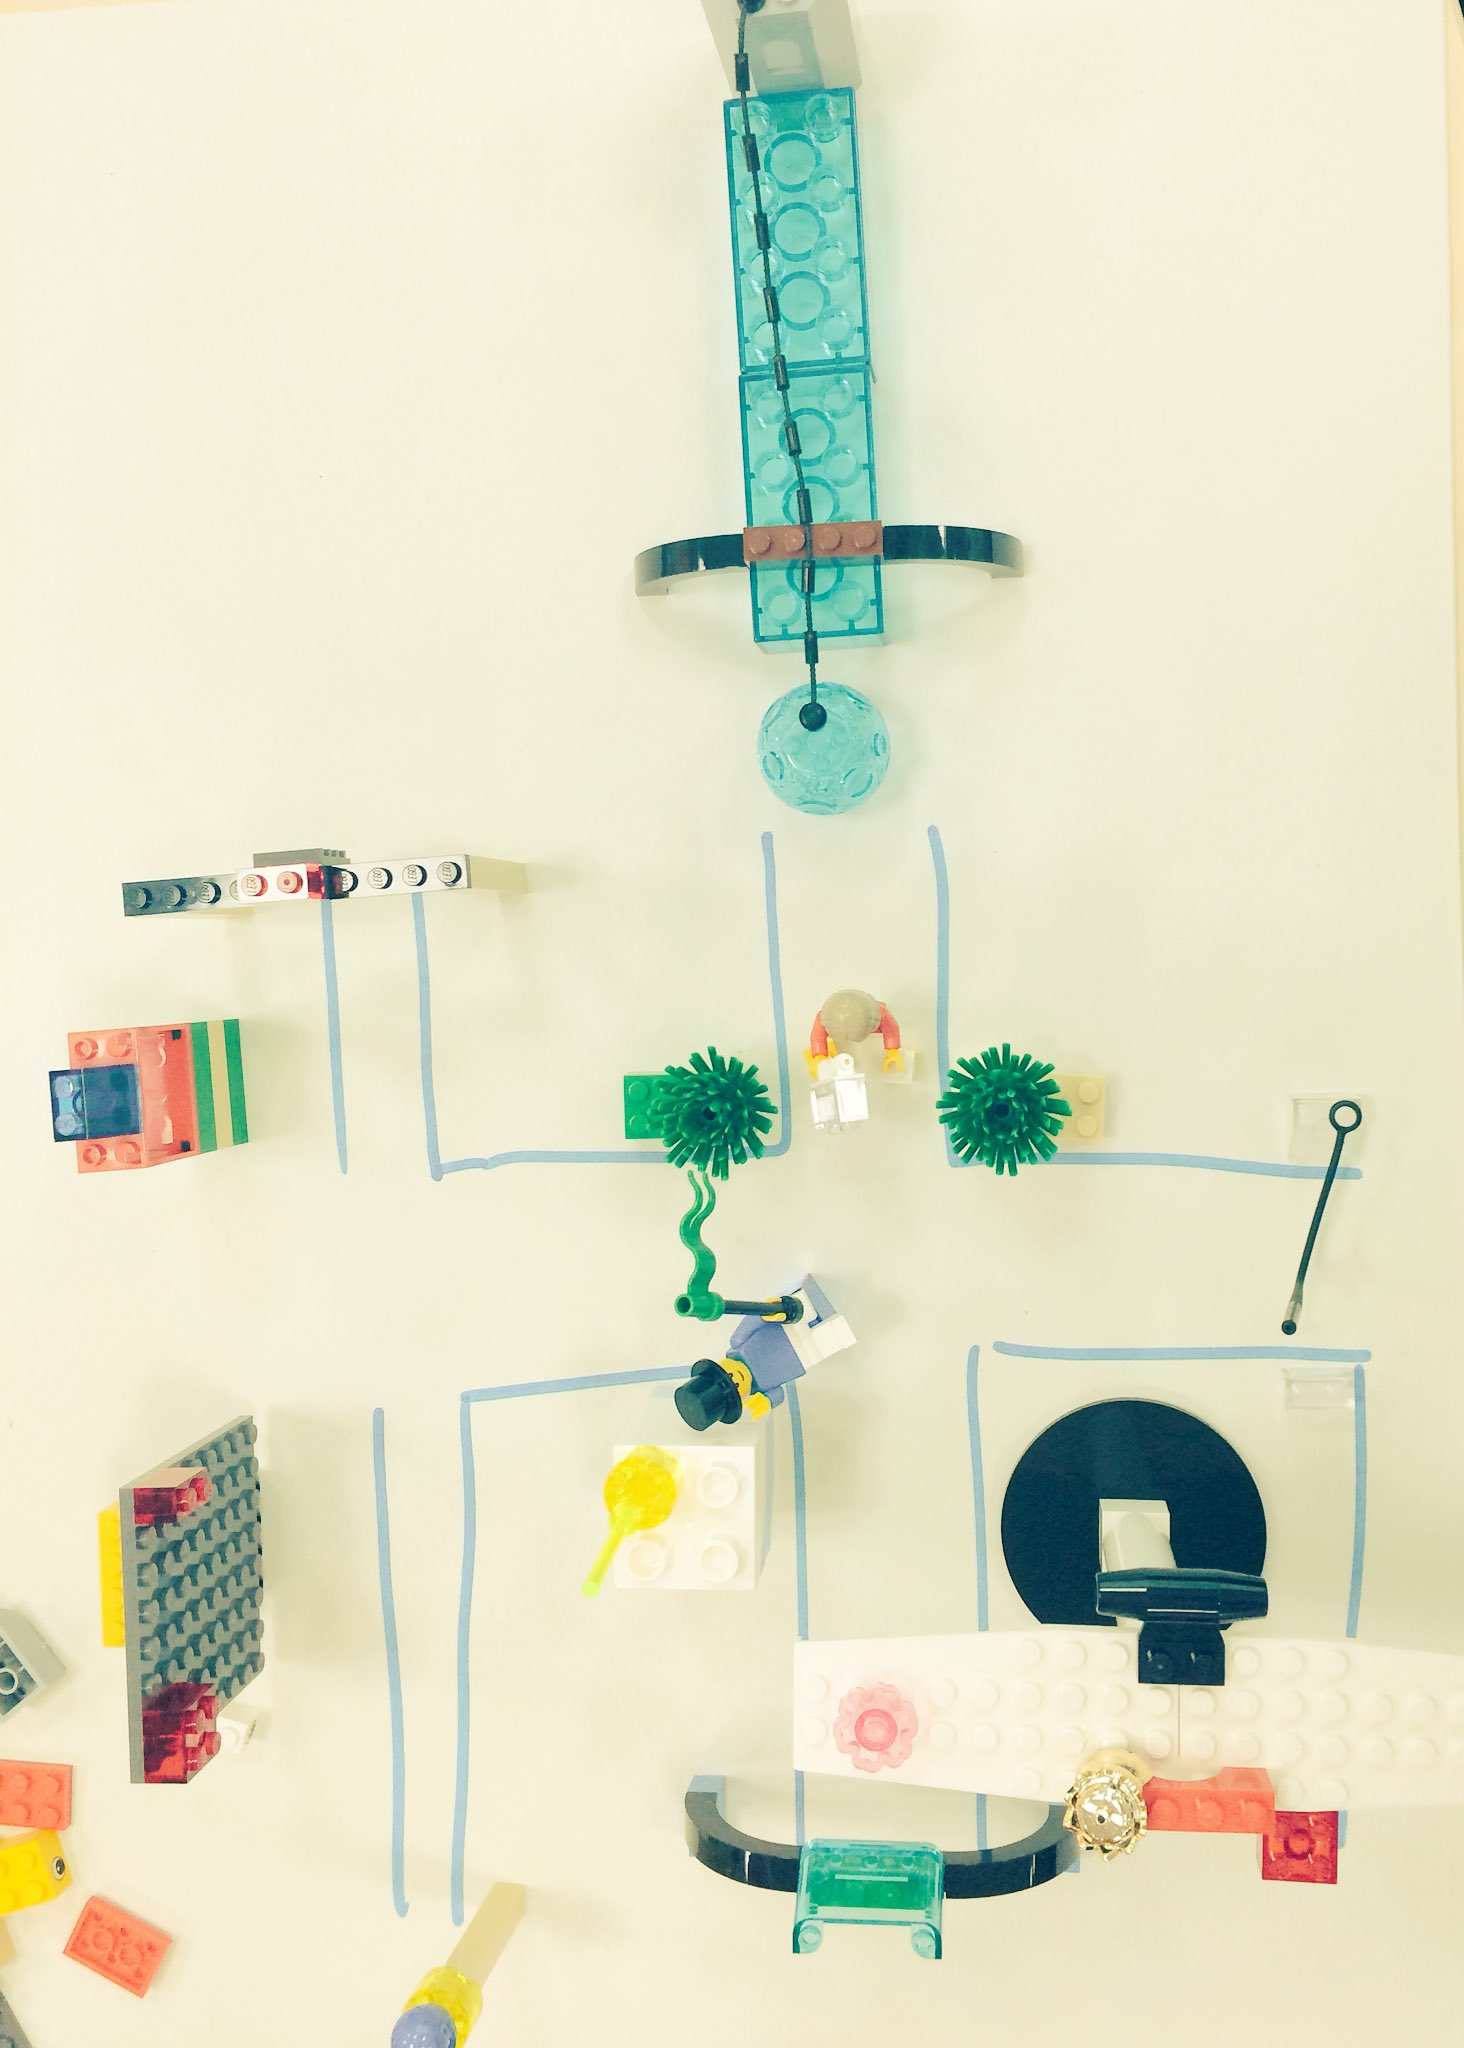 Lego prototyping #studentideas https://t.co/Imfs0RJQgs